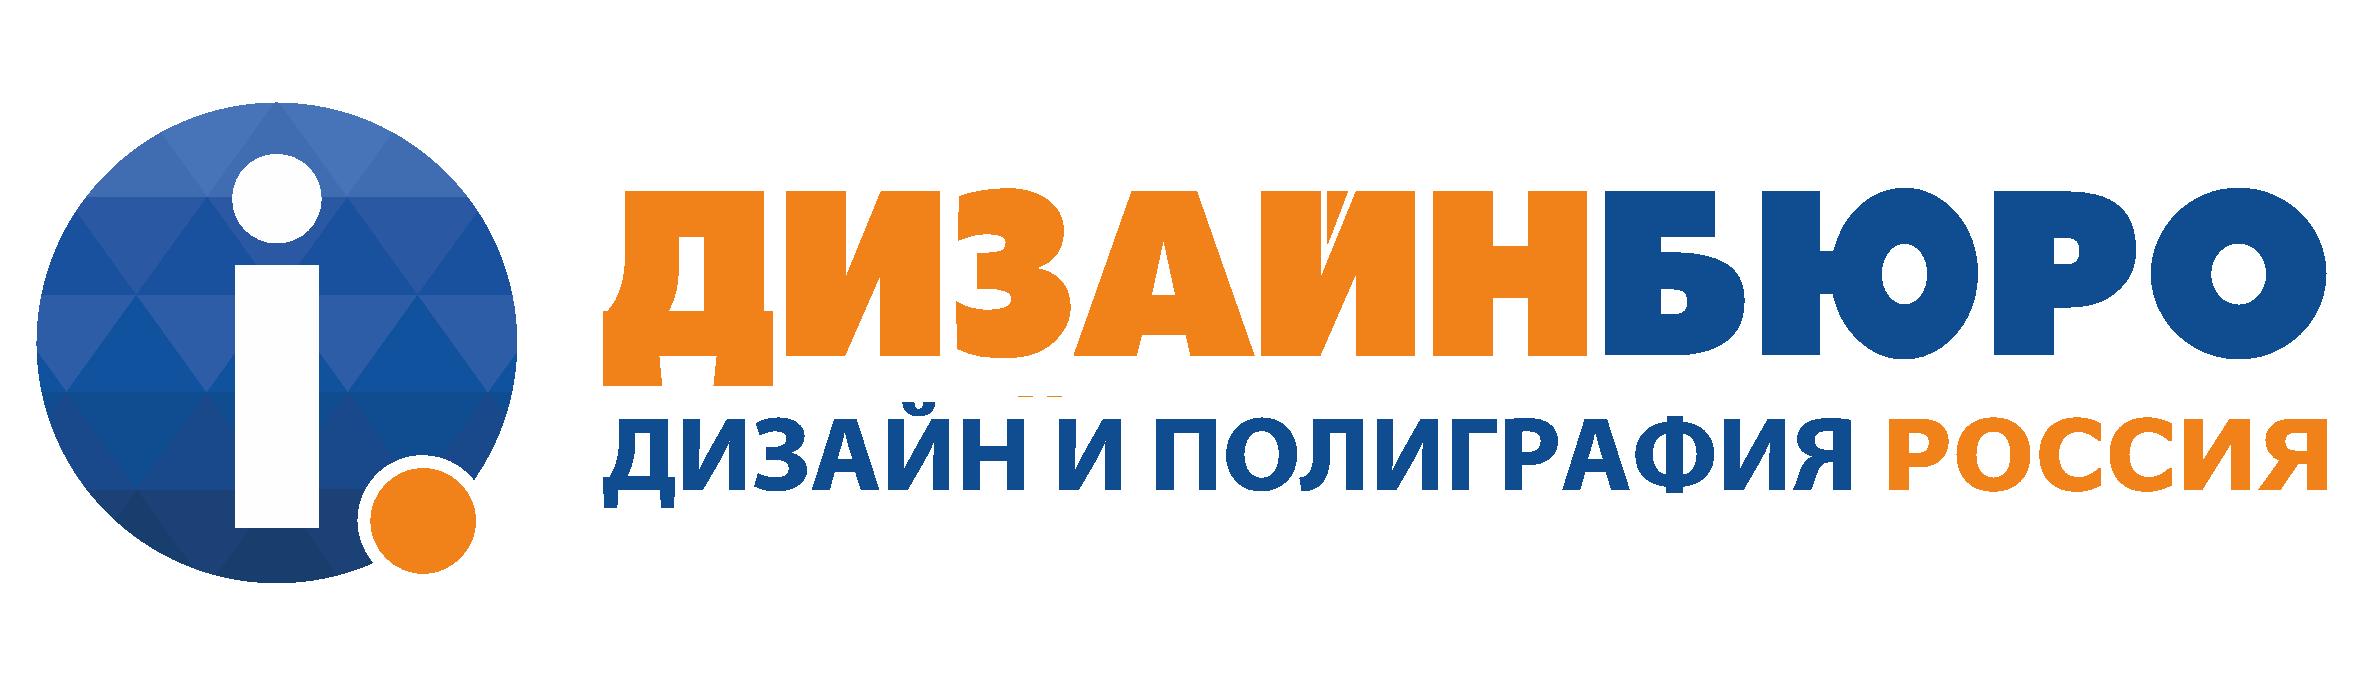 Дизайн услуги омска